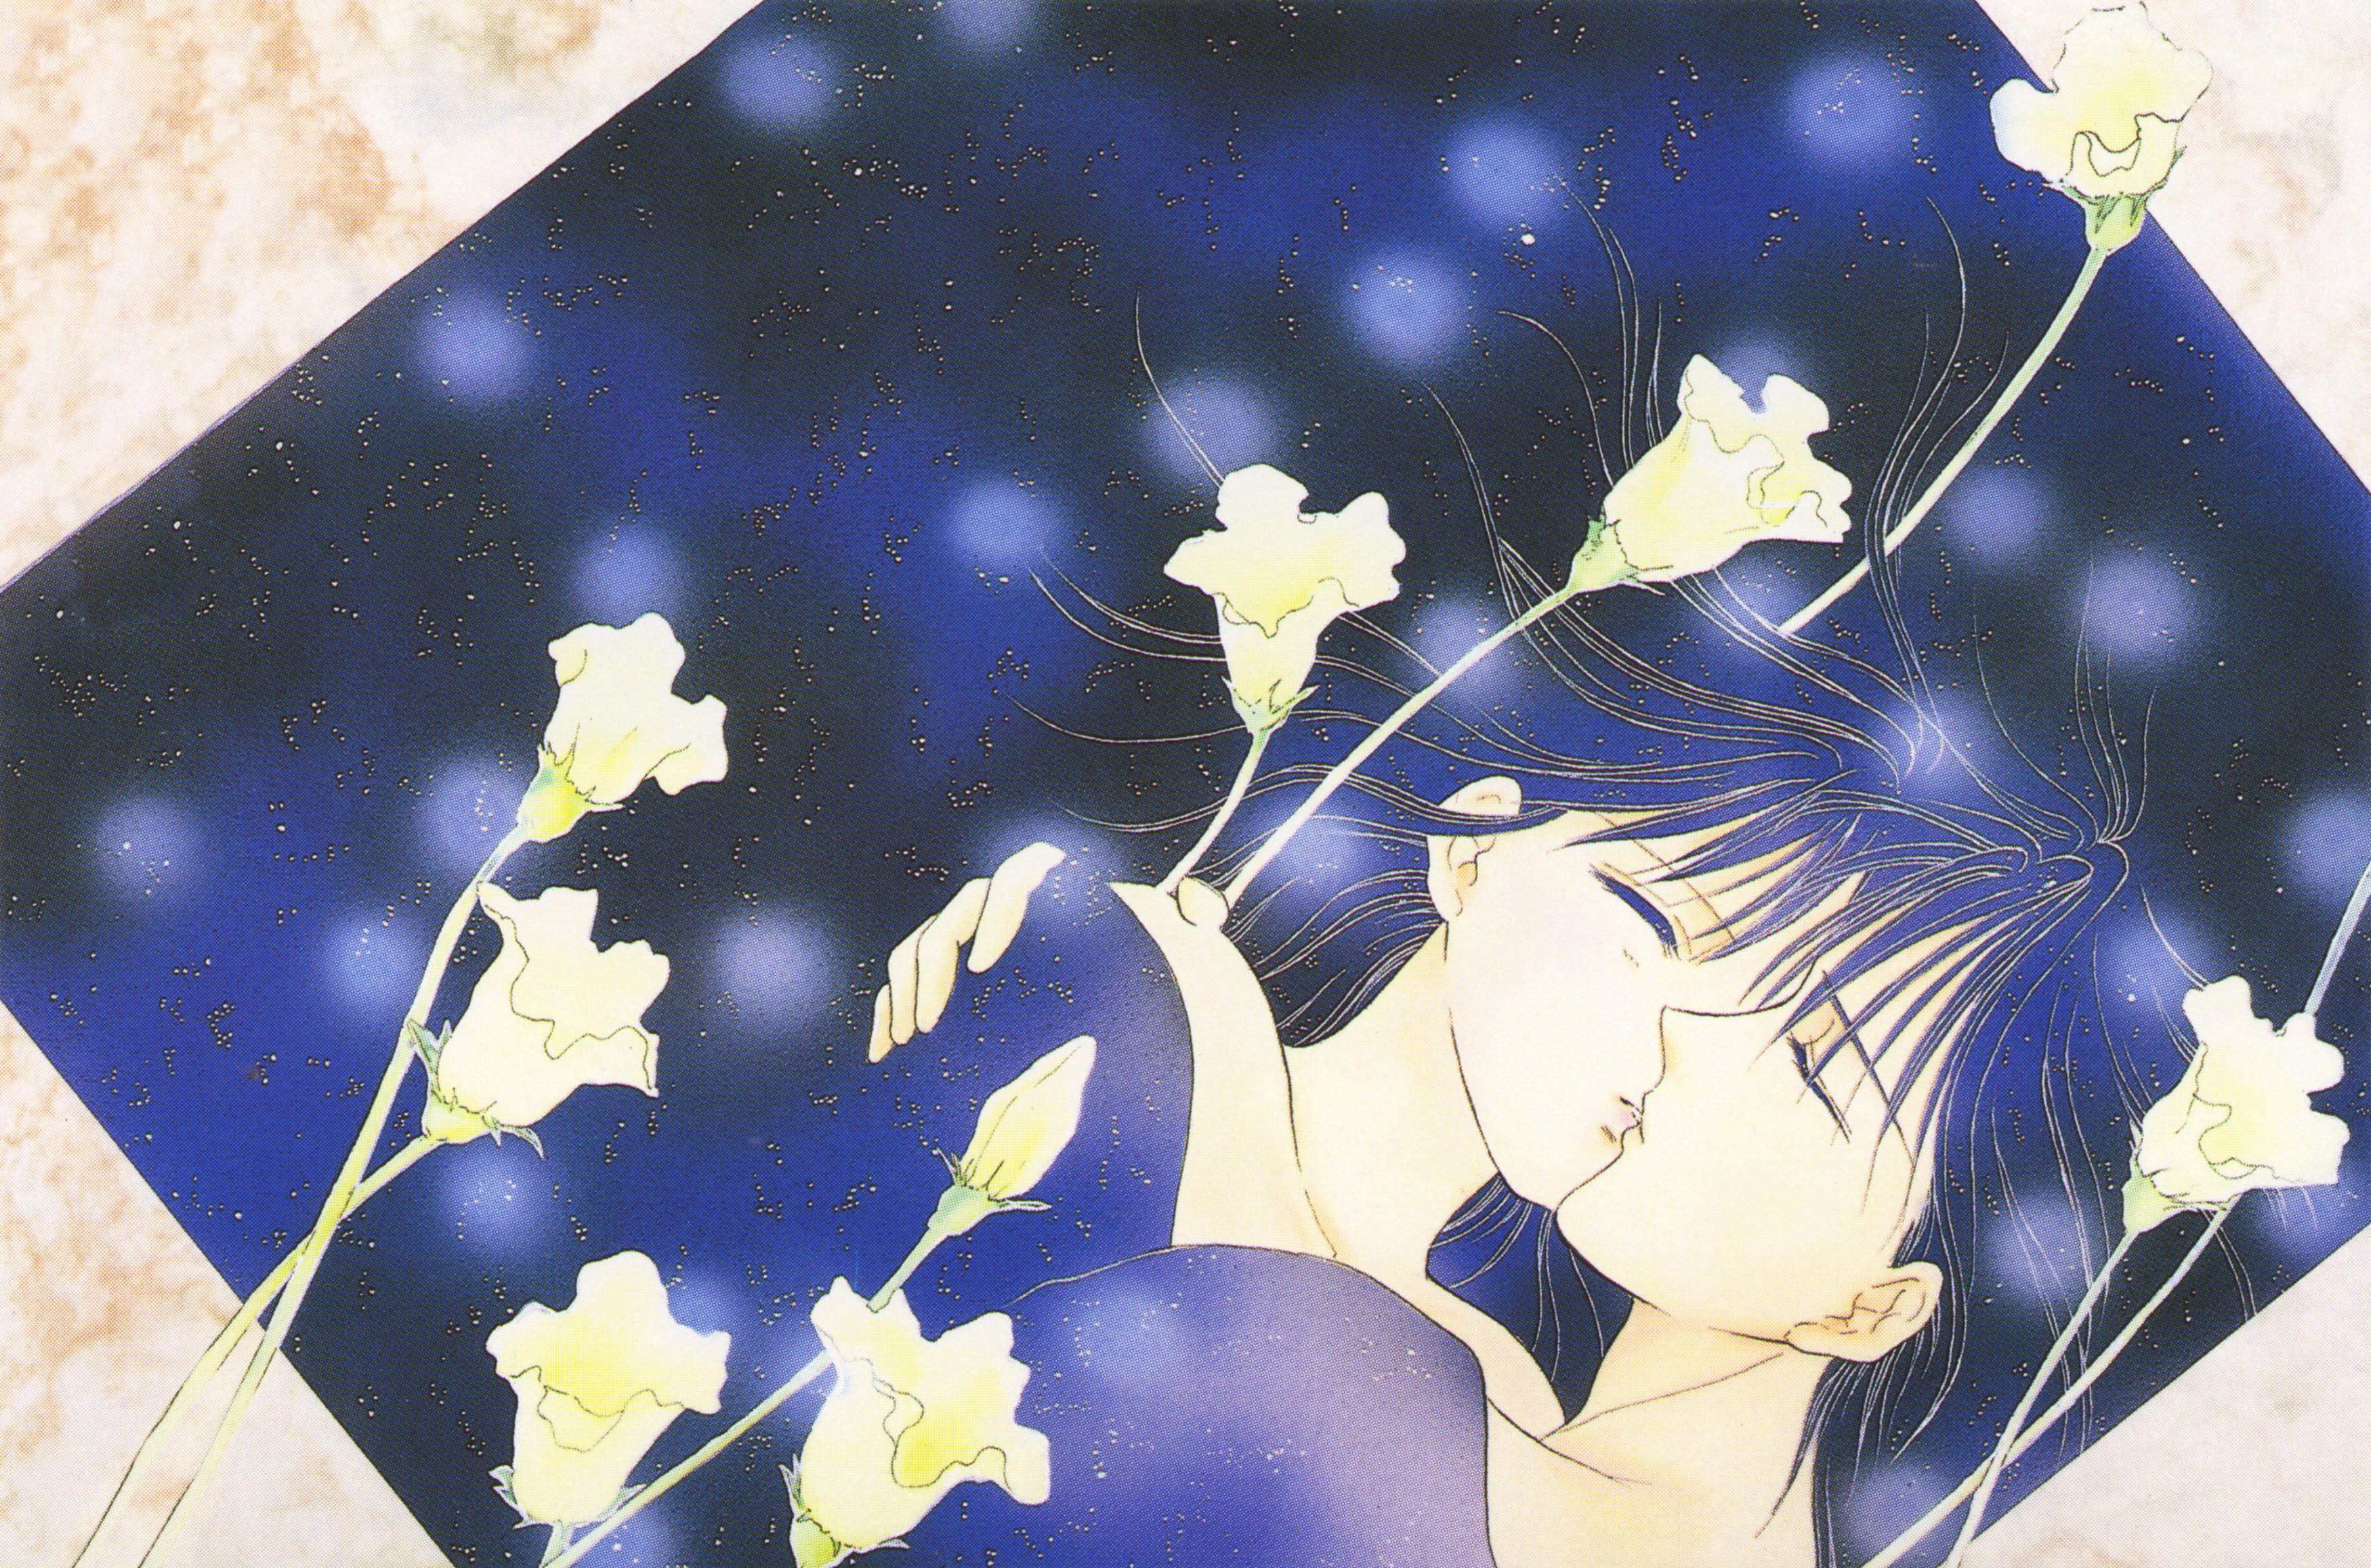 Minitokyo » Fushigi Yuugi Scans » Fushigi Yuugi: Tamahome and Miaka ...